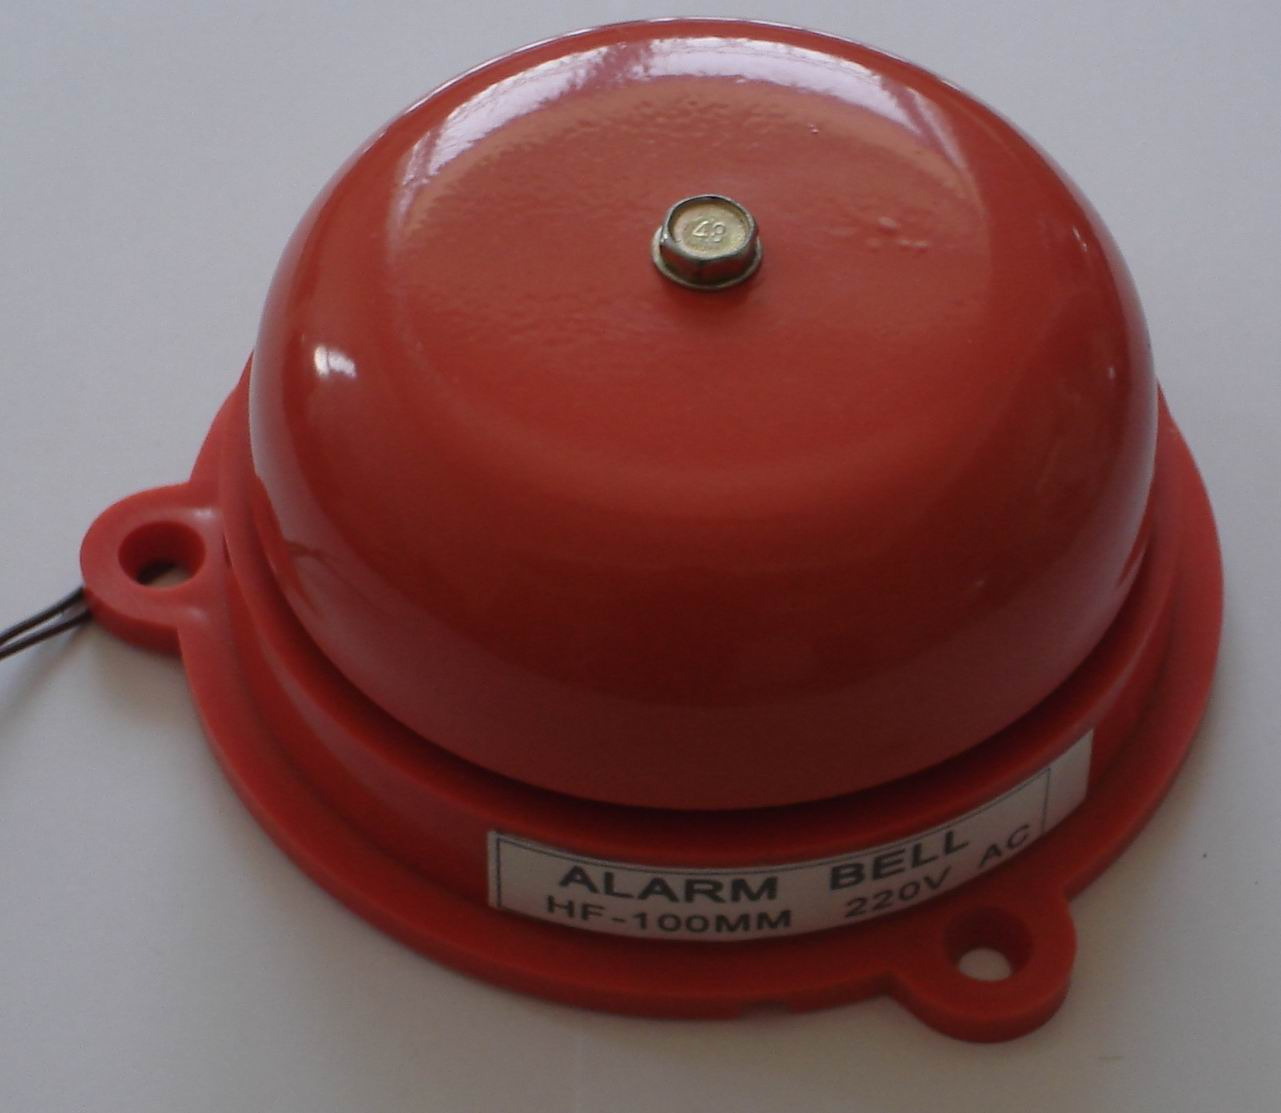 Alat Pemadam Api Termurah Amp Terlengkap Fire Bell Alarm